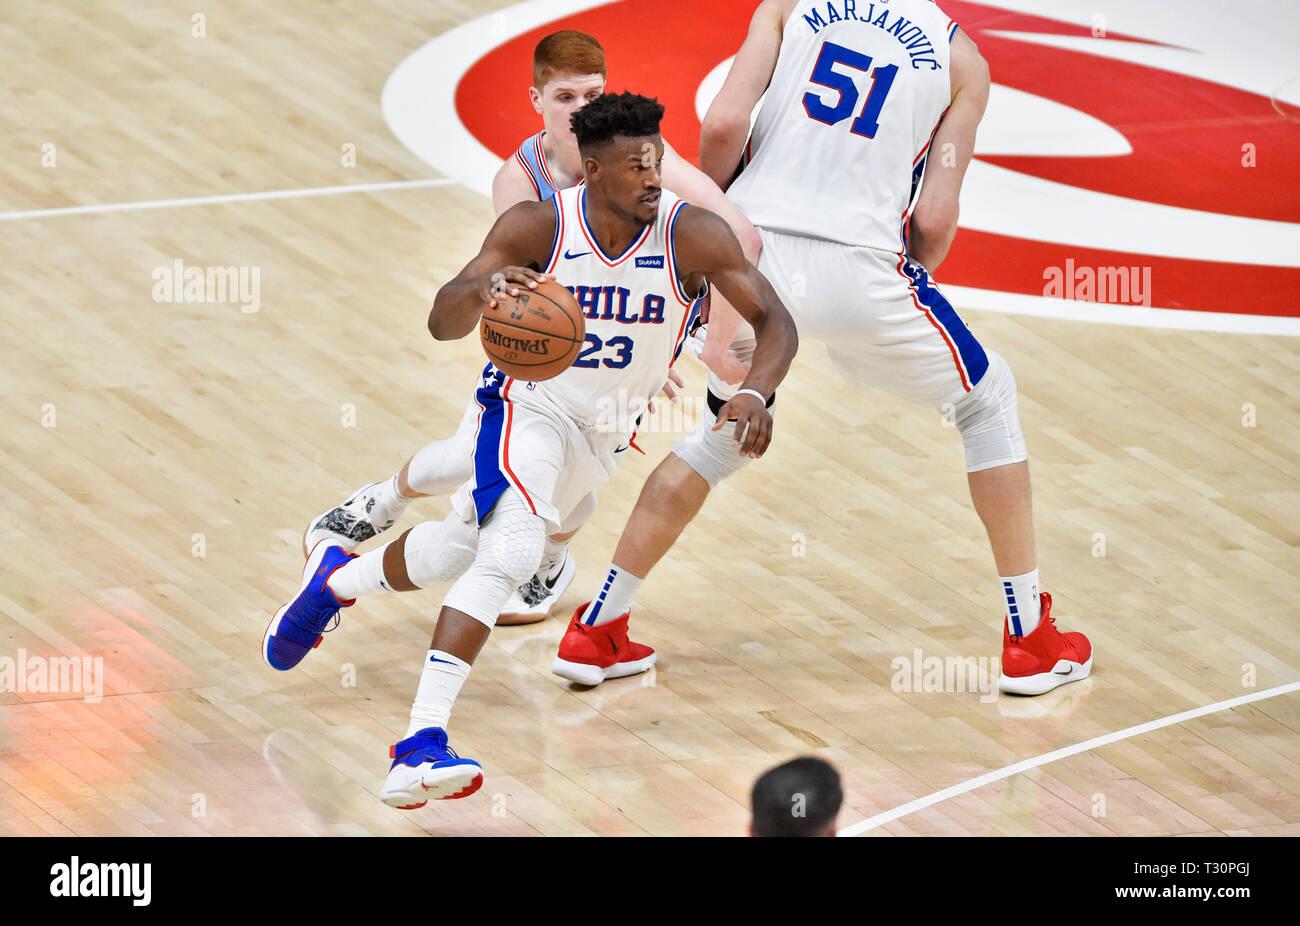 Atlanta, GA, USA  3rd Apr, 2019  Philadelphia 76ers guard